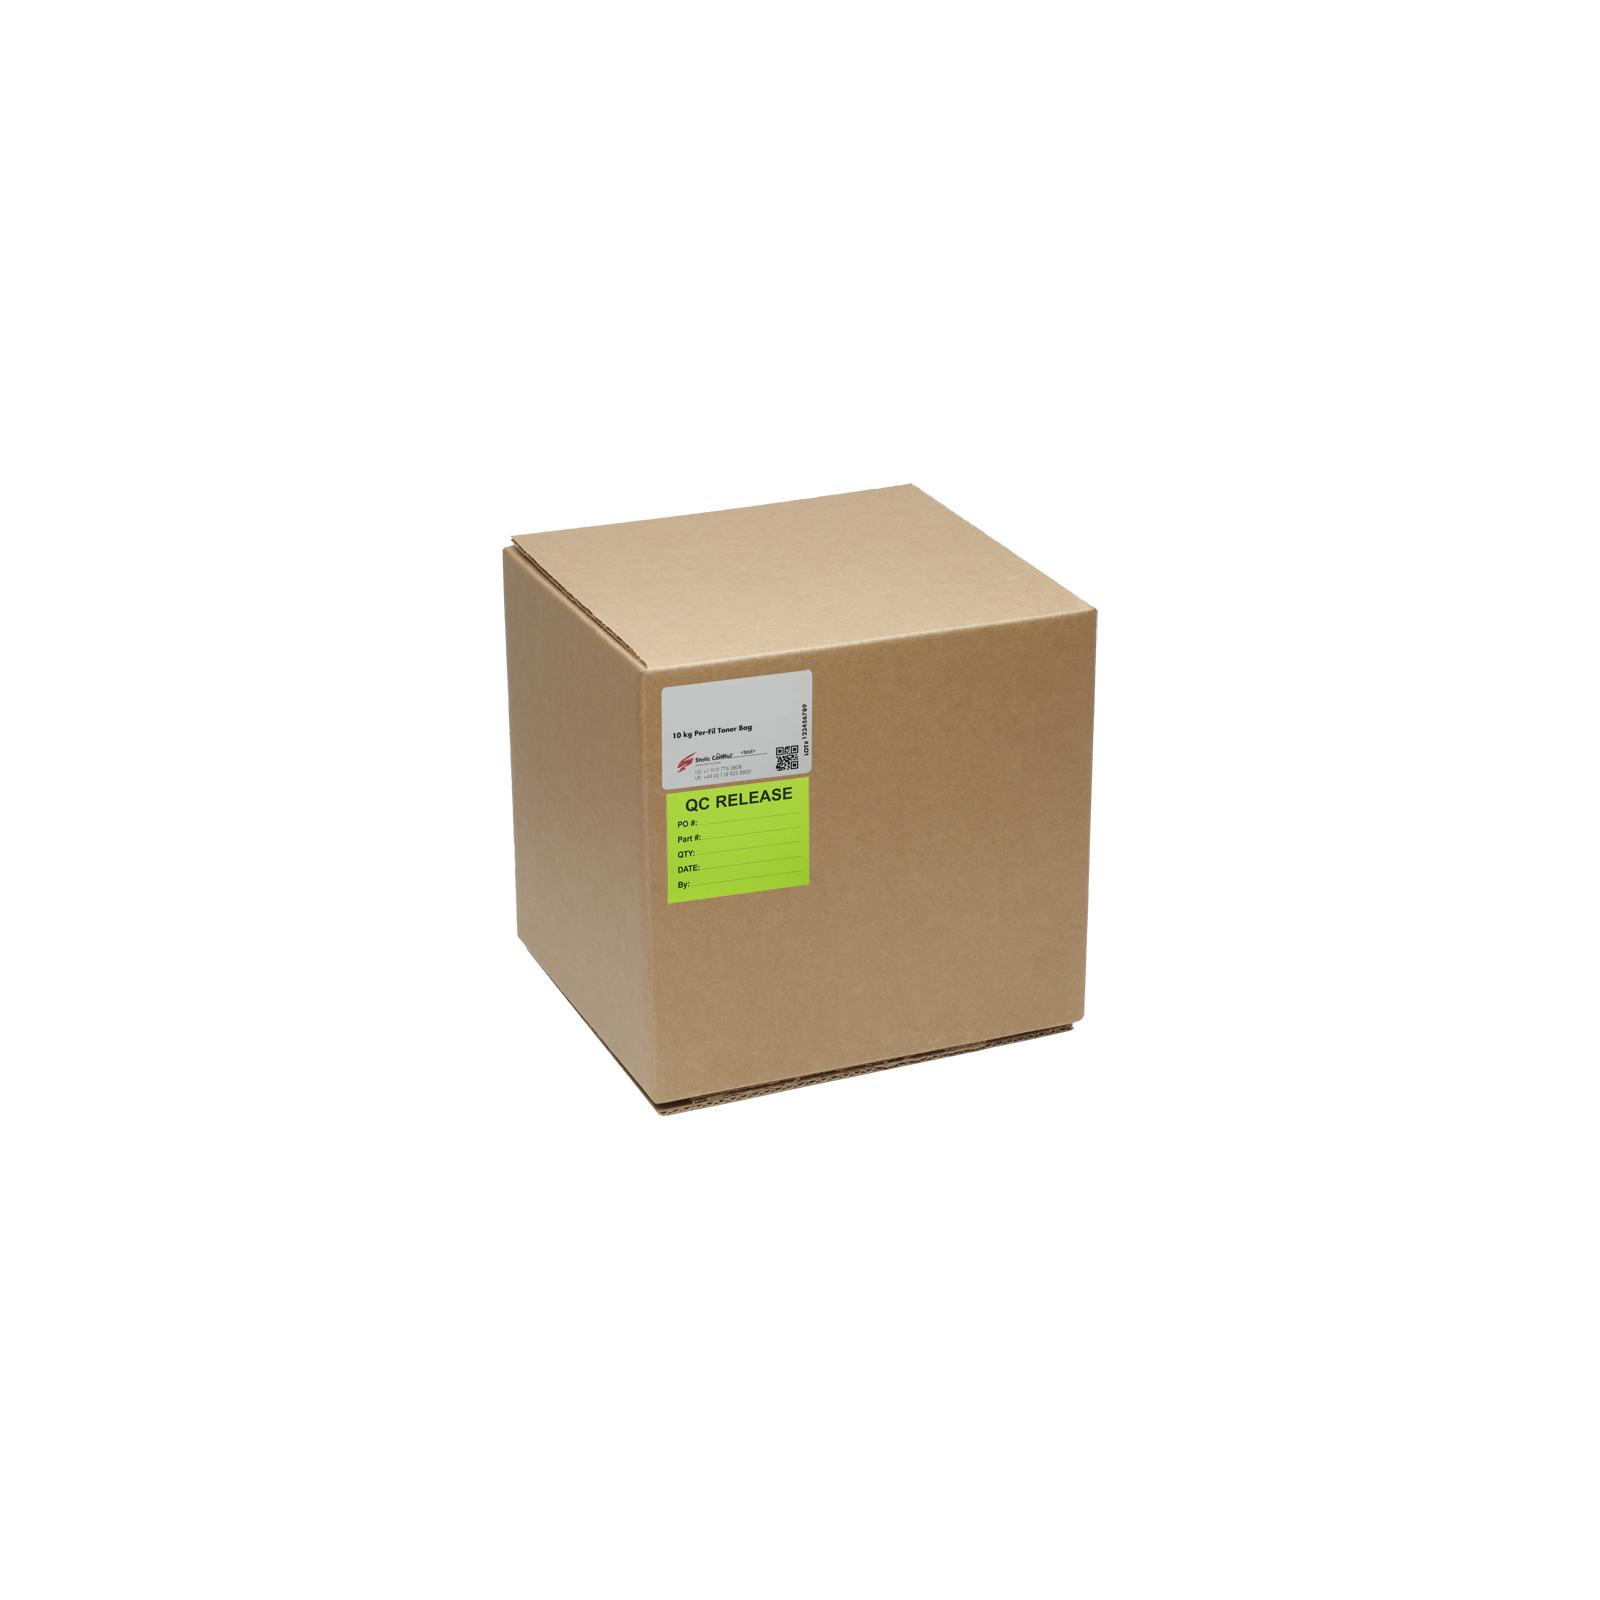 Тонер HP CLJ ProM452 10кг black Static Control (HM452-10KG-KOS)